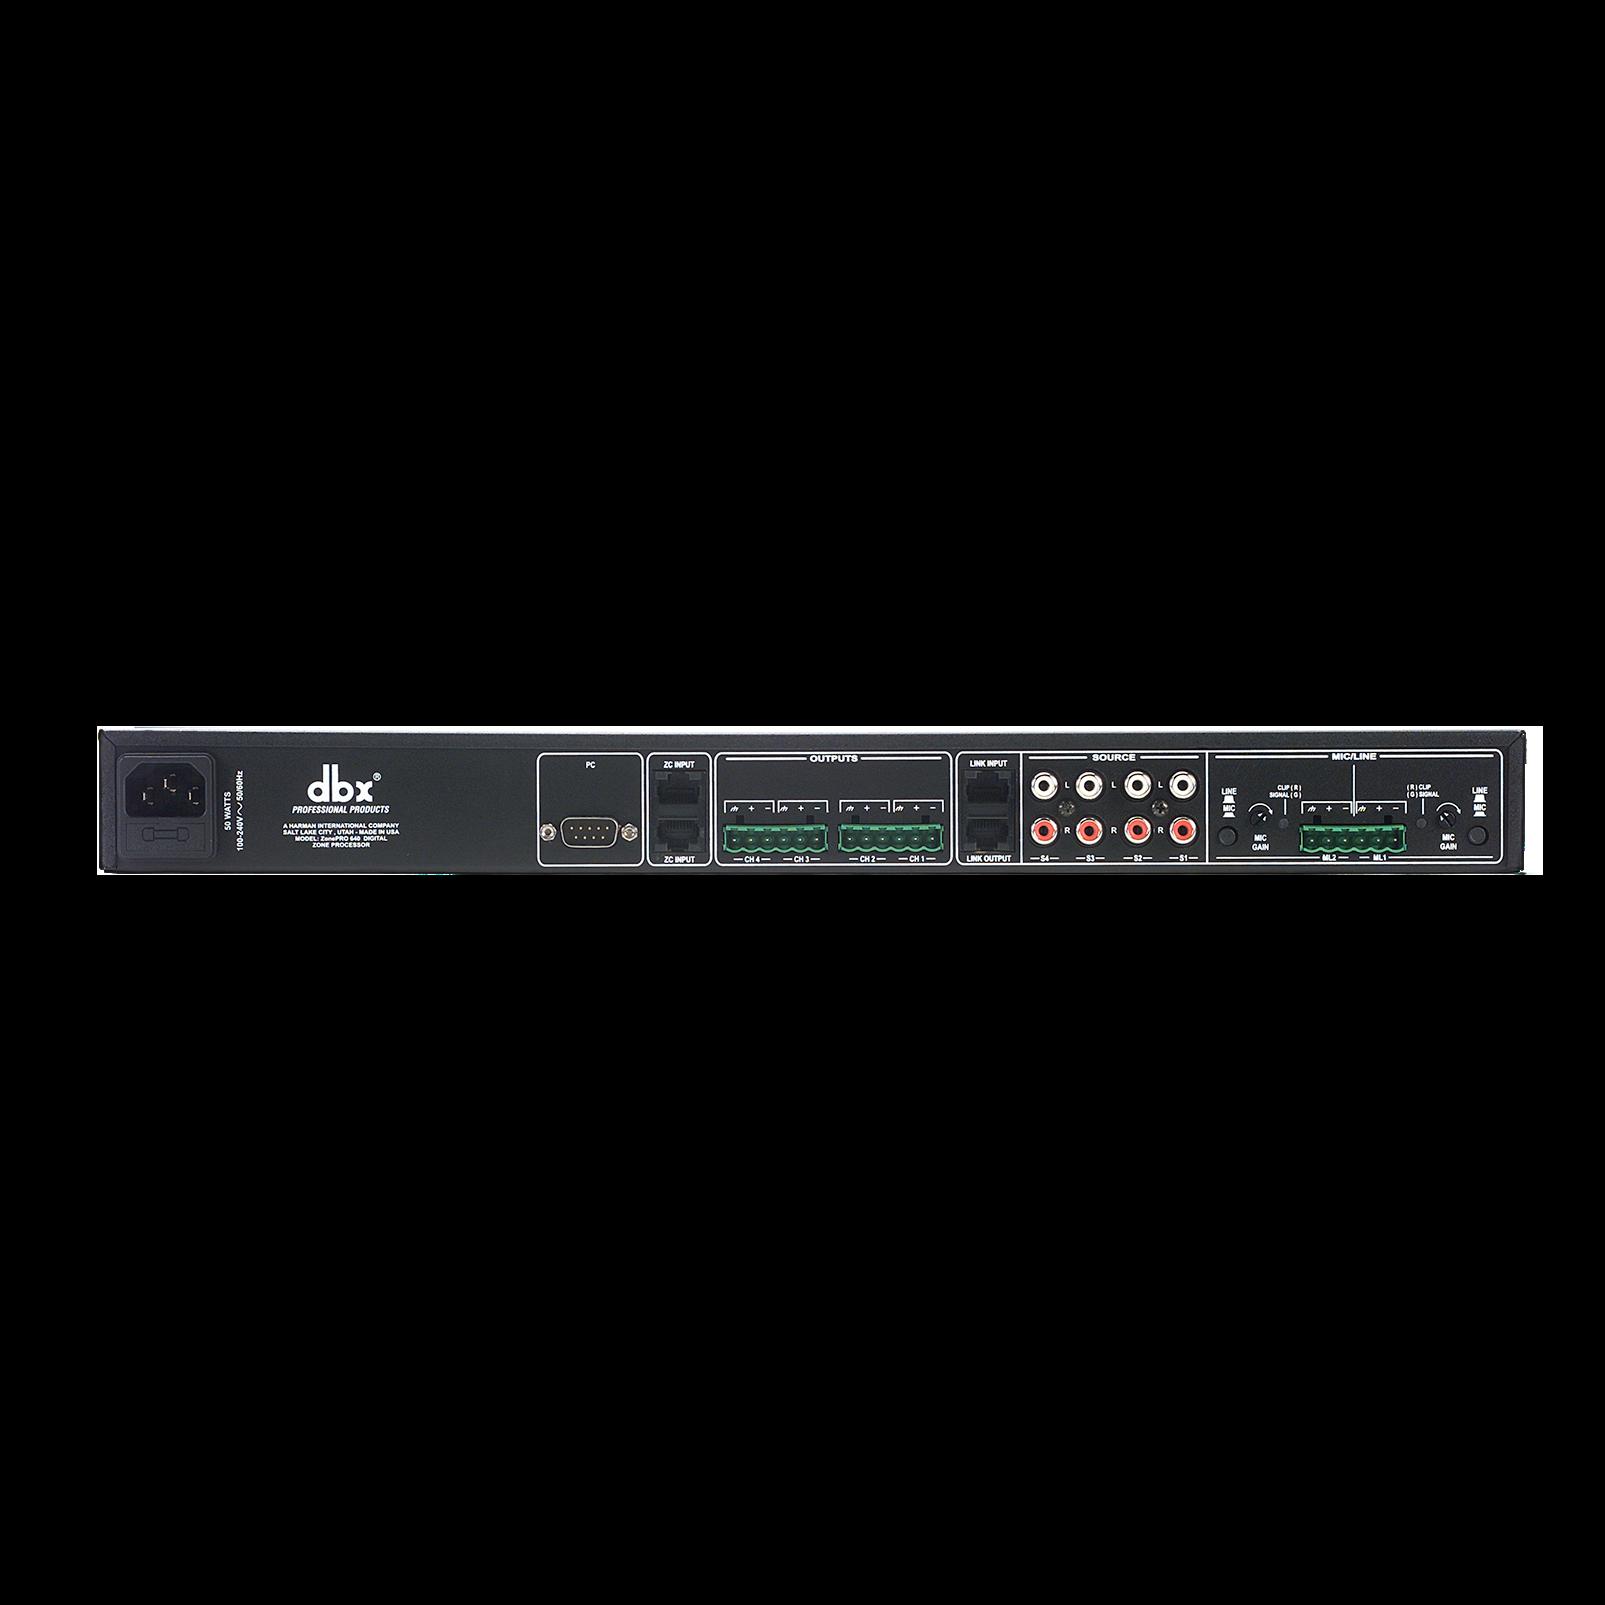 ZonePro 640 - Black - 6x4 Digital Zone Processor - Back